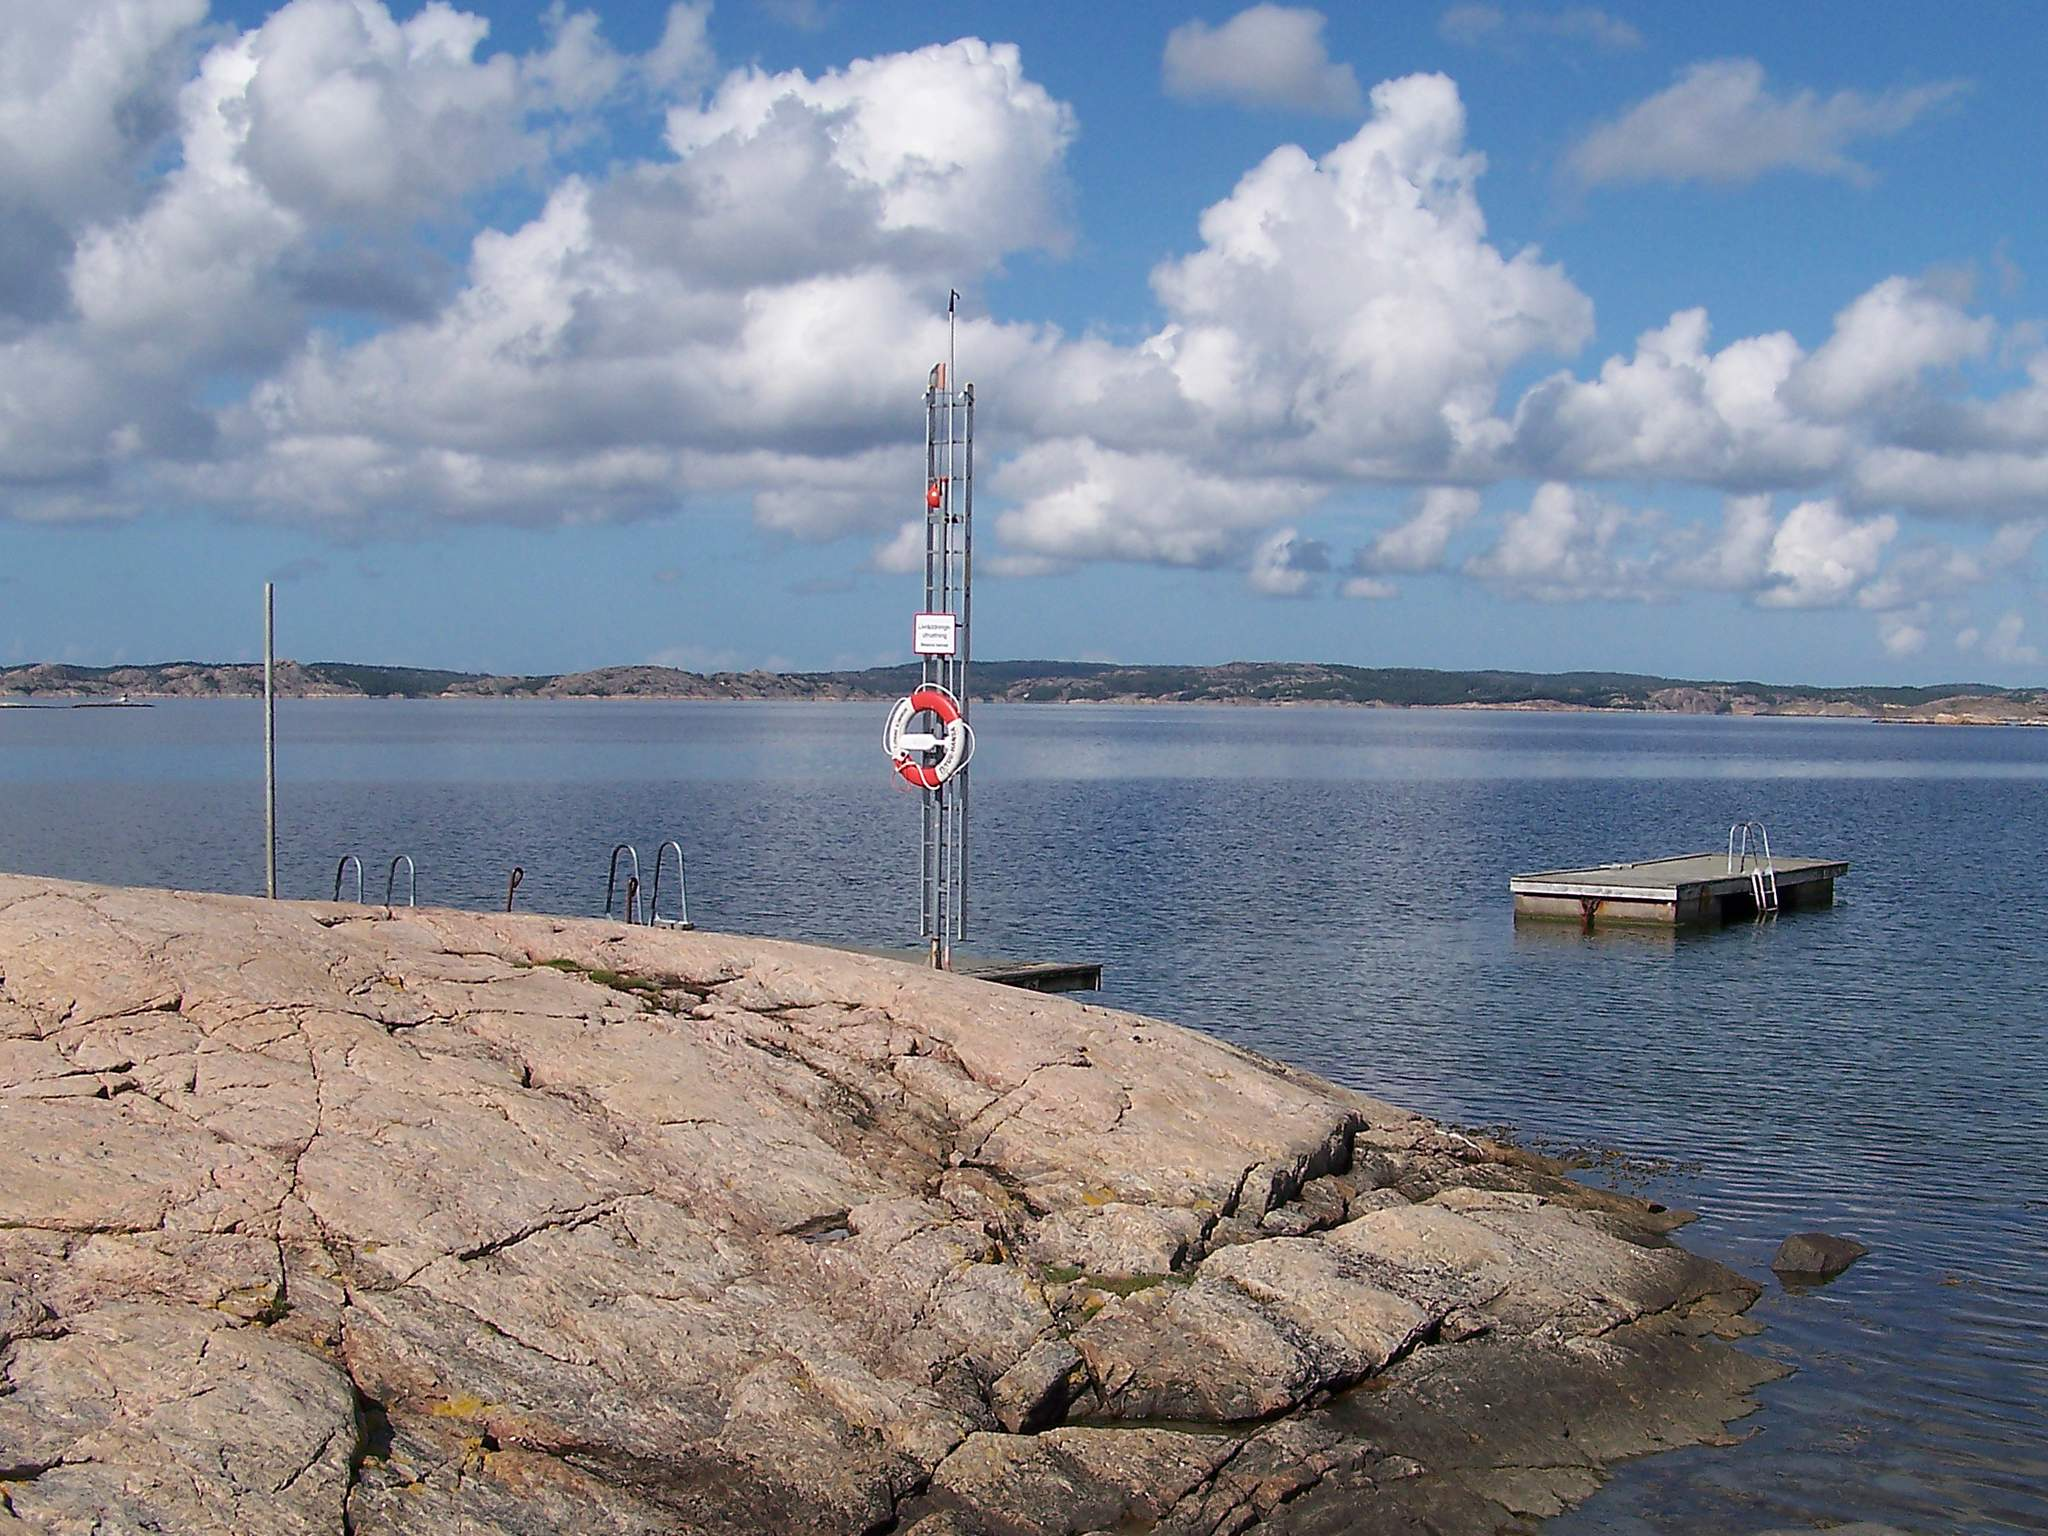 Ferienhaus Tjörn/Huseberg (672440), Kållekärr, Tjörn, Westschweden, Schweden, Bild 19